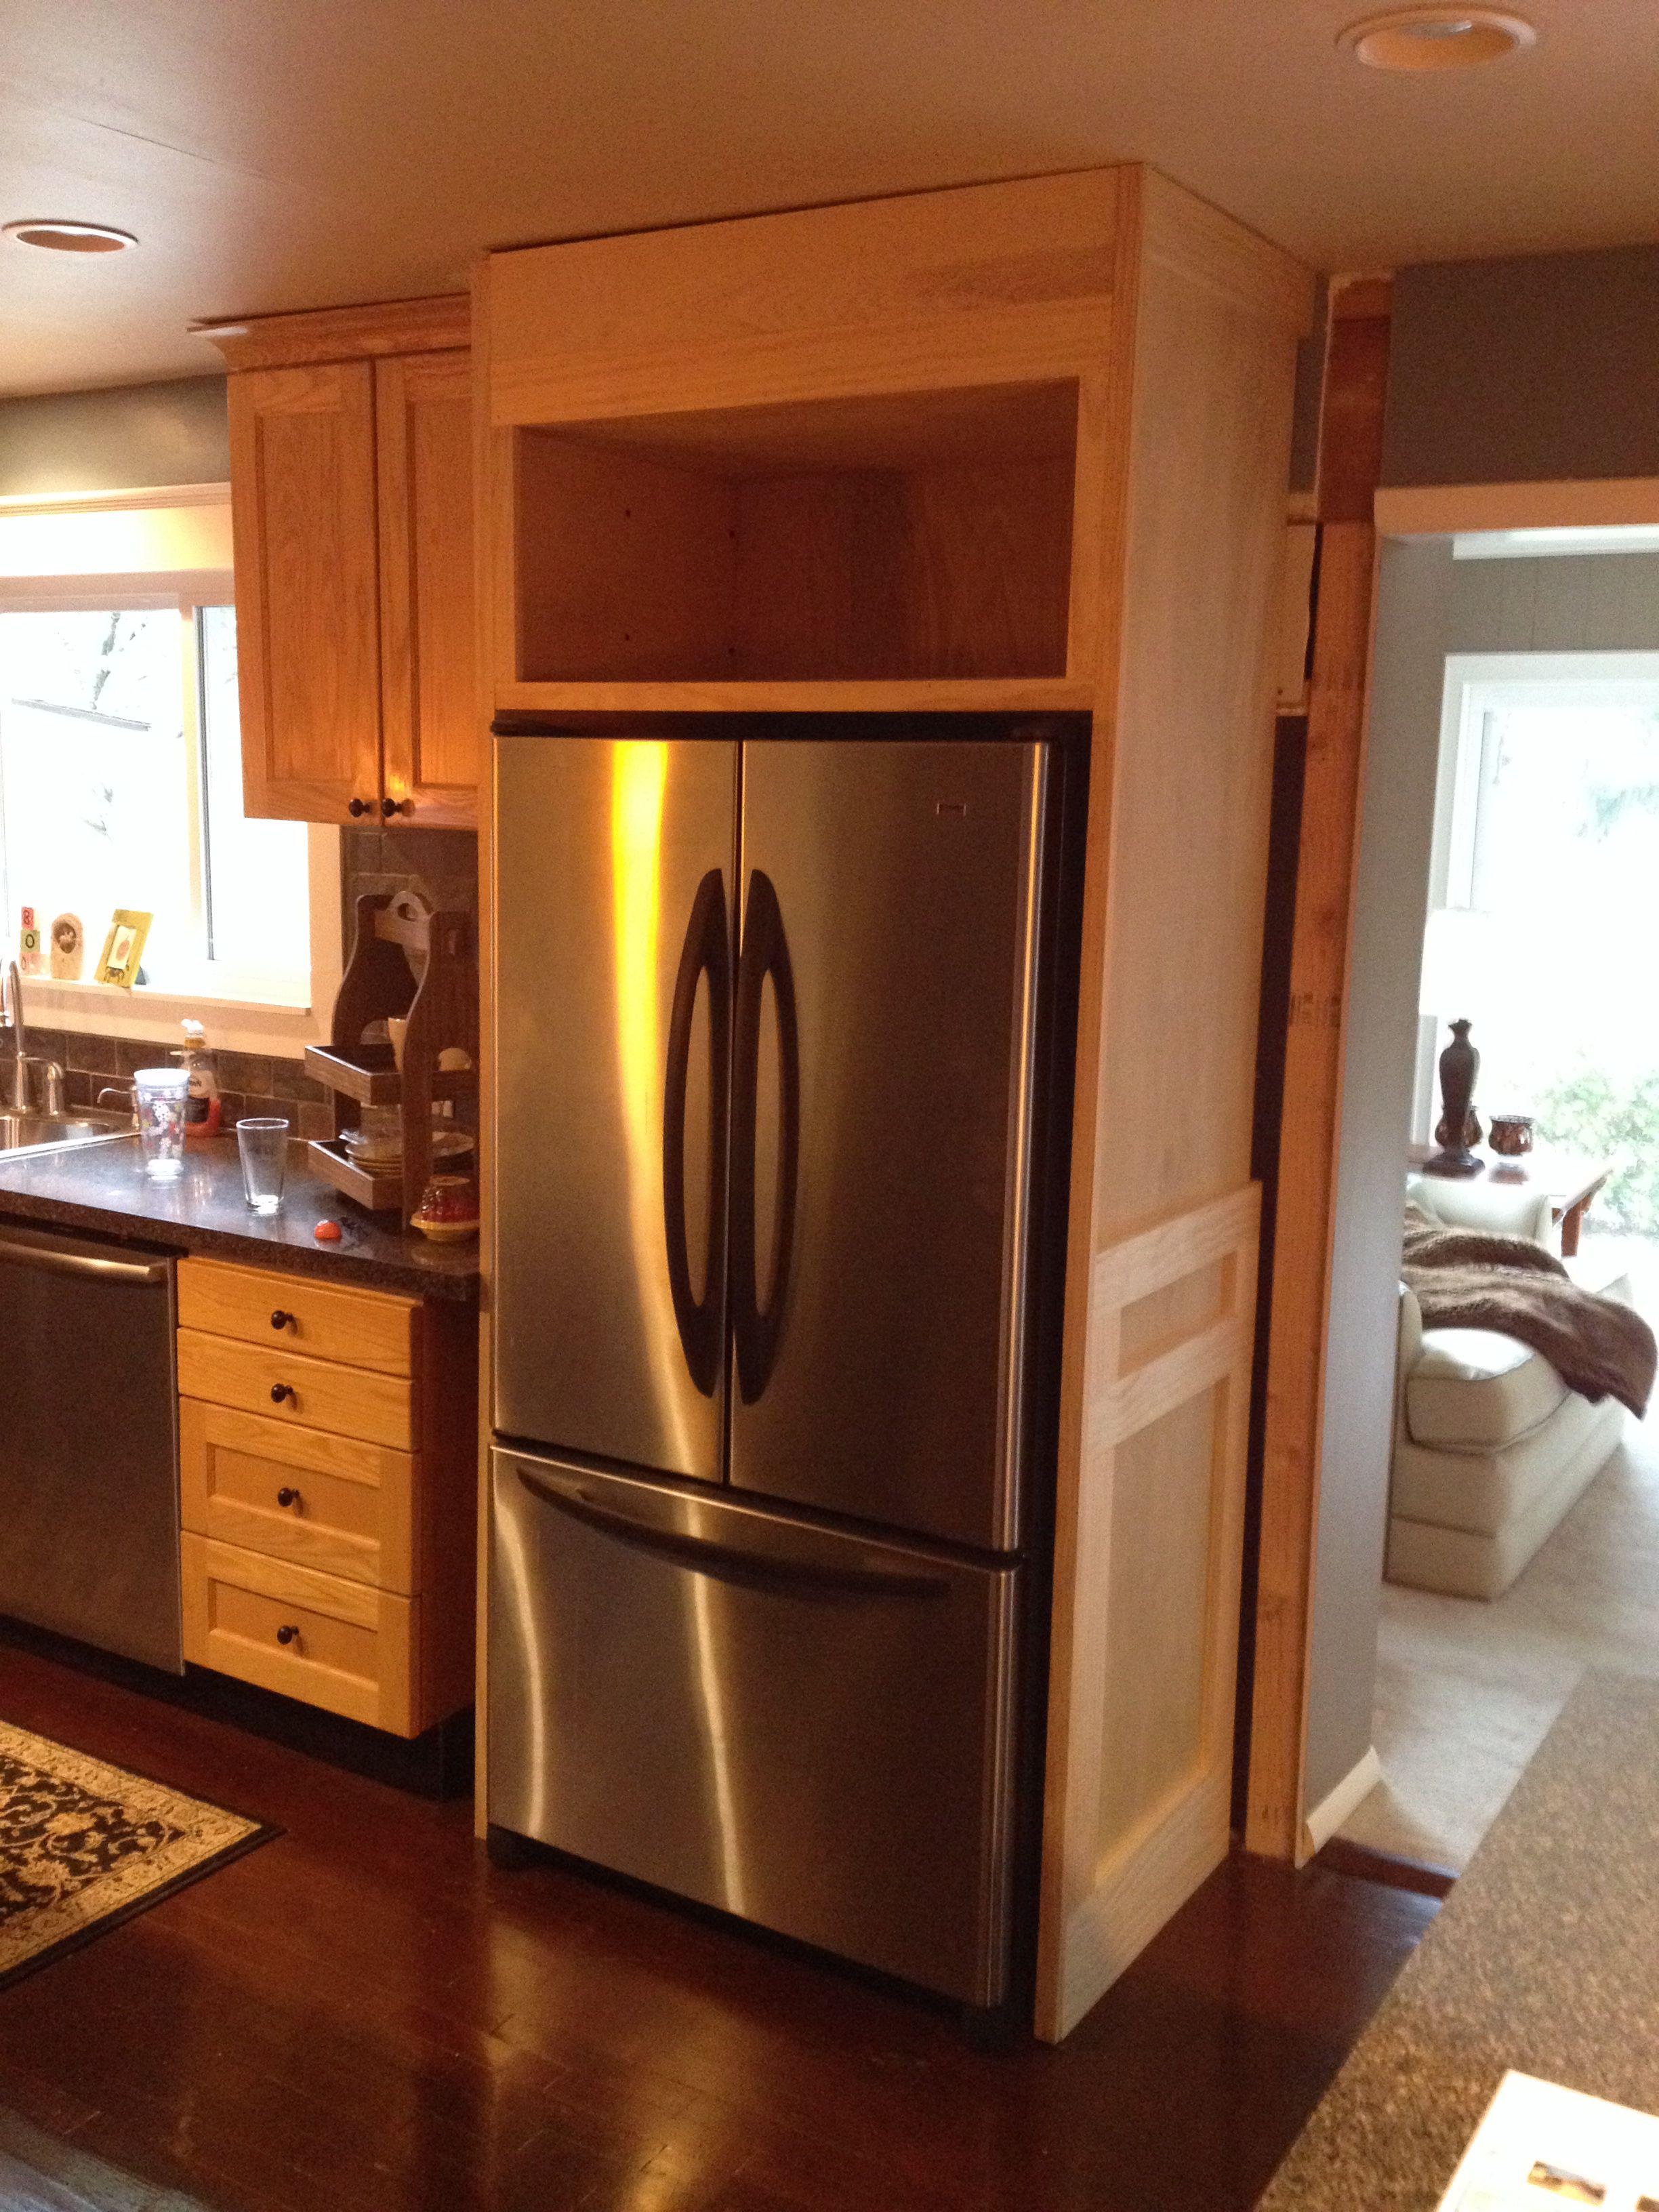 Refrigerator Enclosure Home Decor Kitchen Kitchen Remodel Cost Kitchen Built Ins